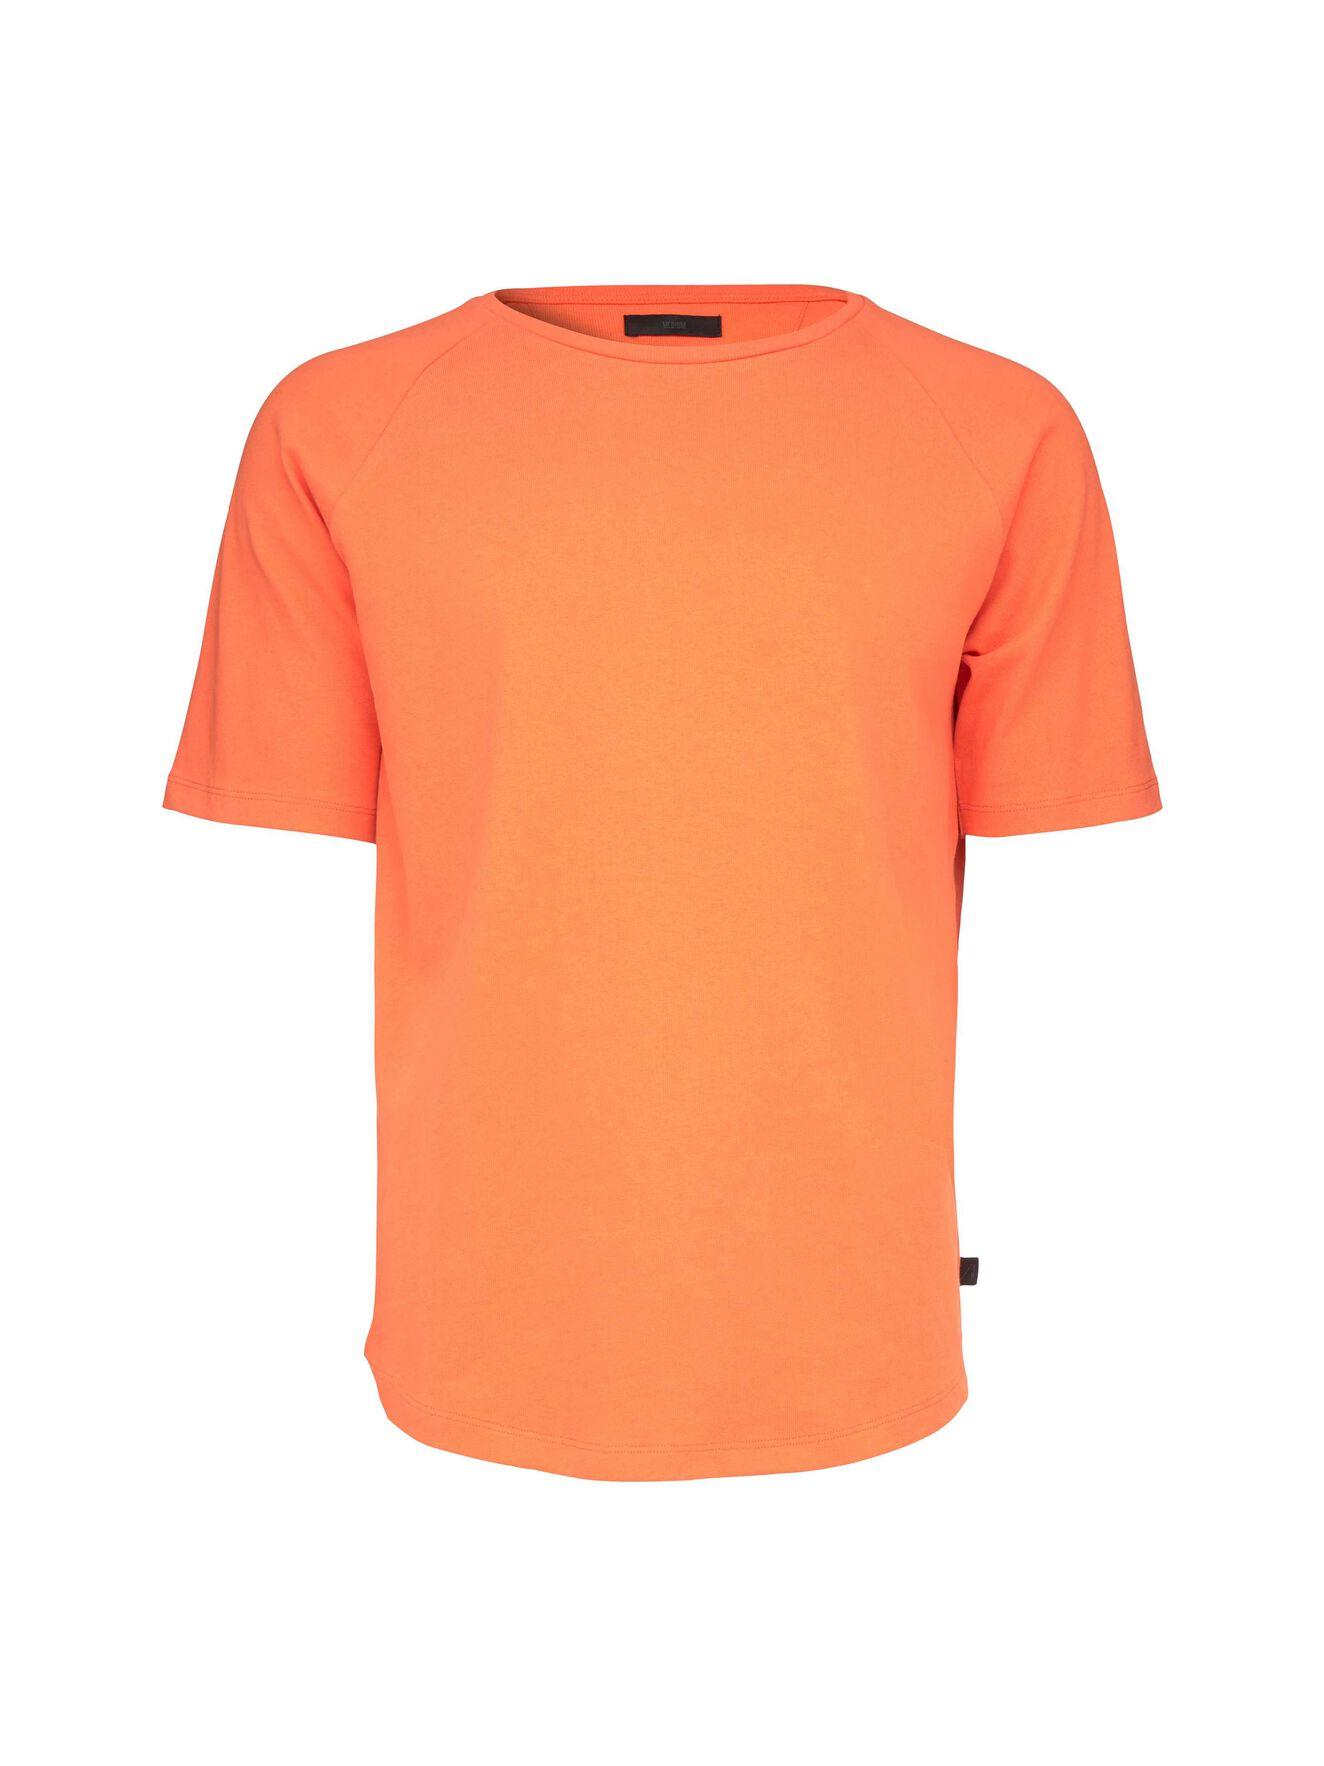 Side T-Shirt in Firecracker from Tiger of Sweden